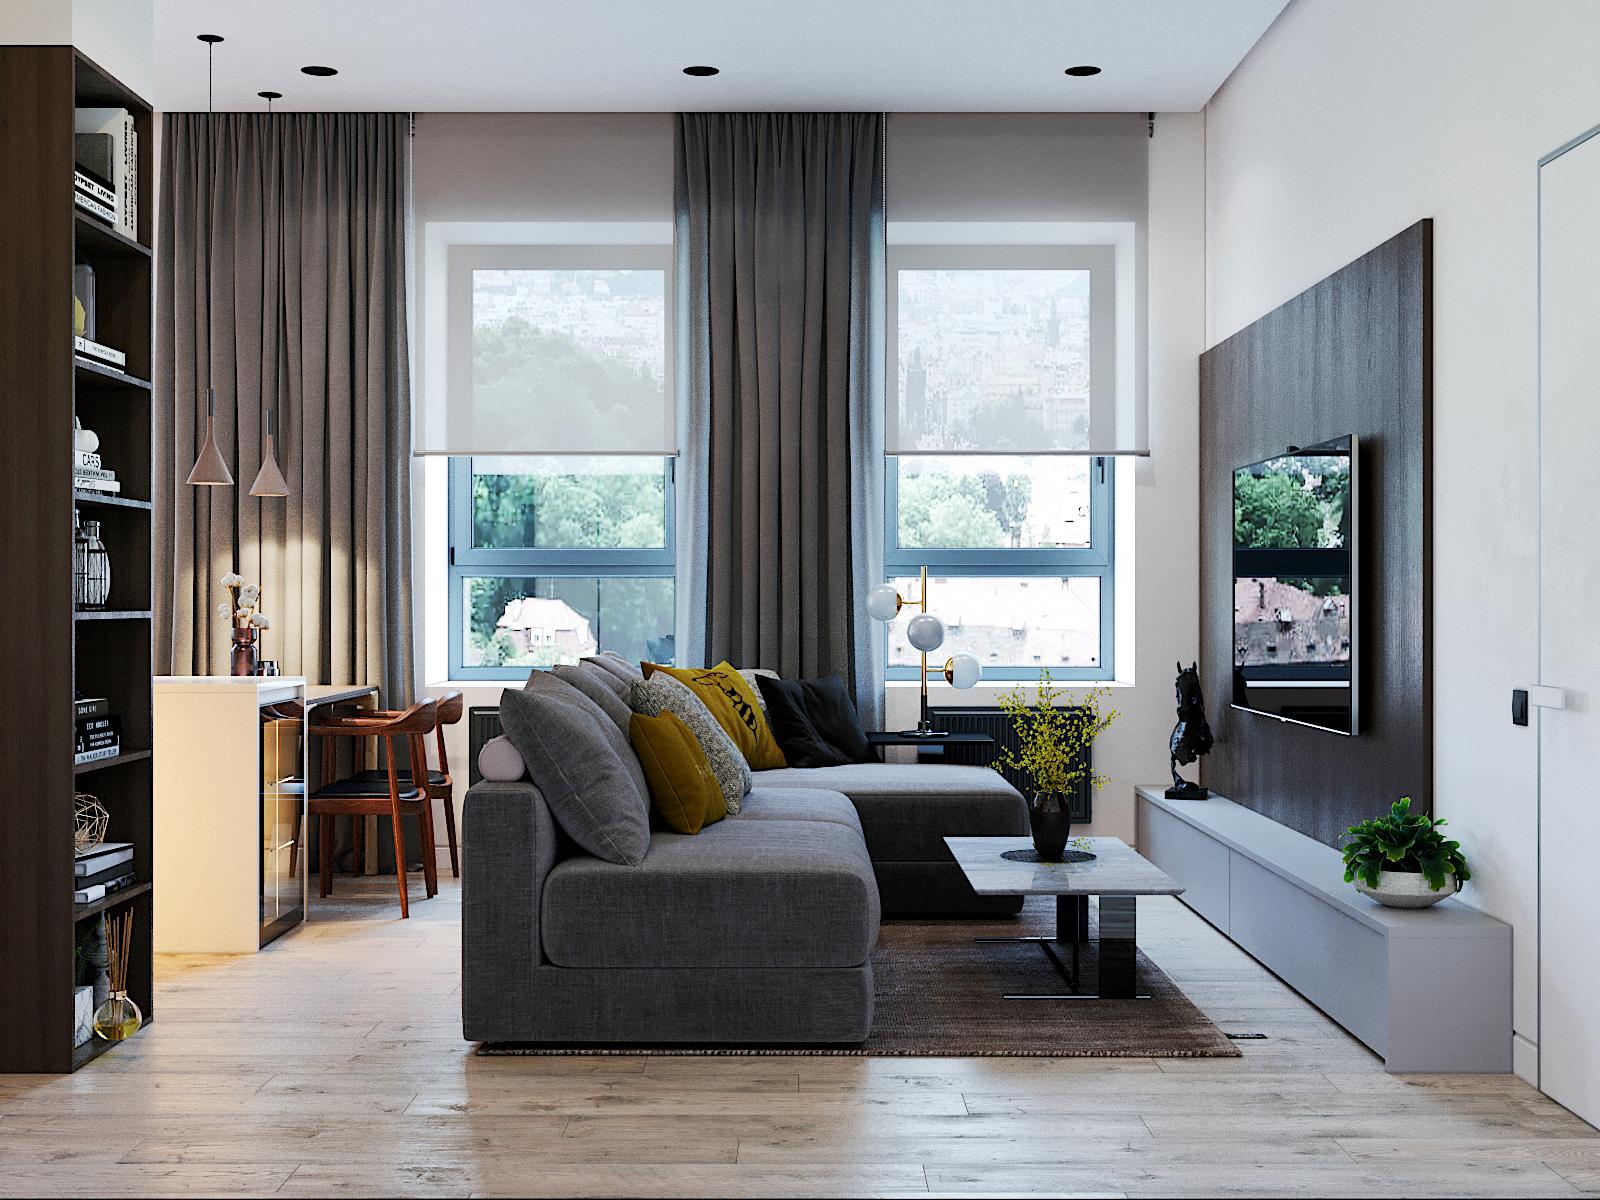 https://avantum-remont.ru/wp-content/uploads/2015/05/Livingroom-Kitchen_Interactive-LightMix_View02.jpg